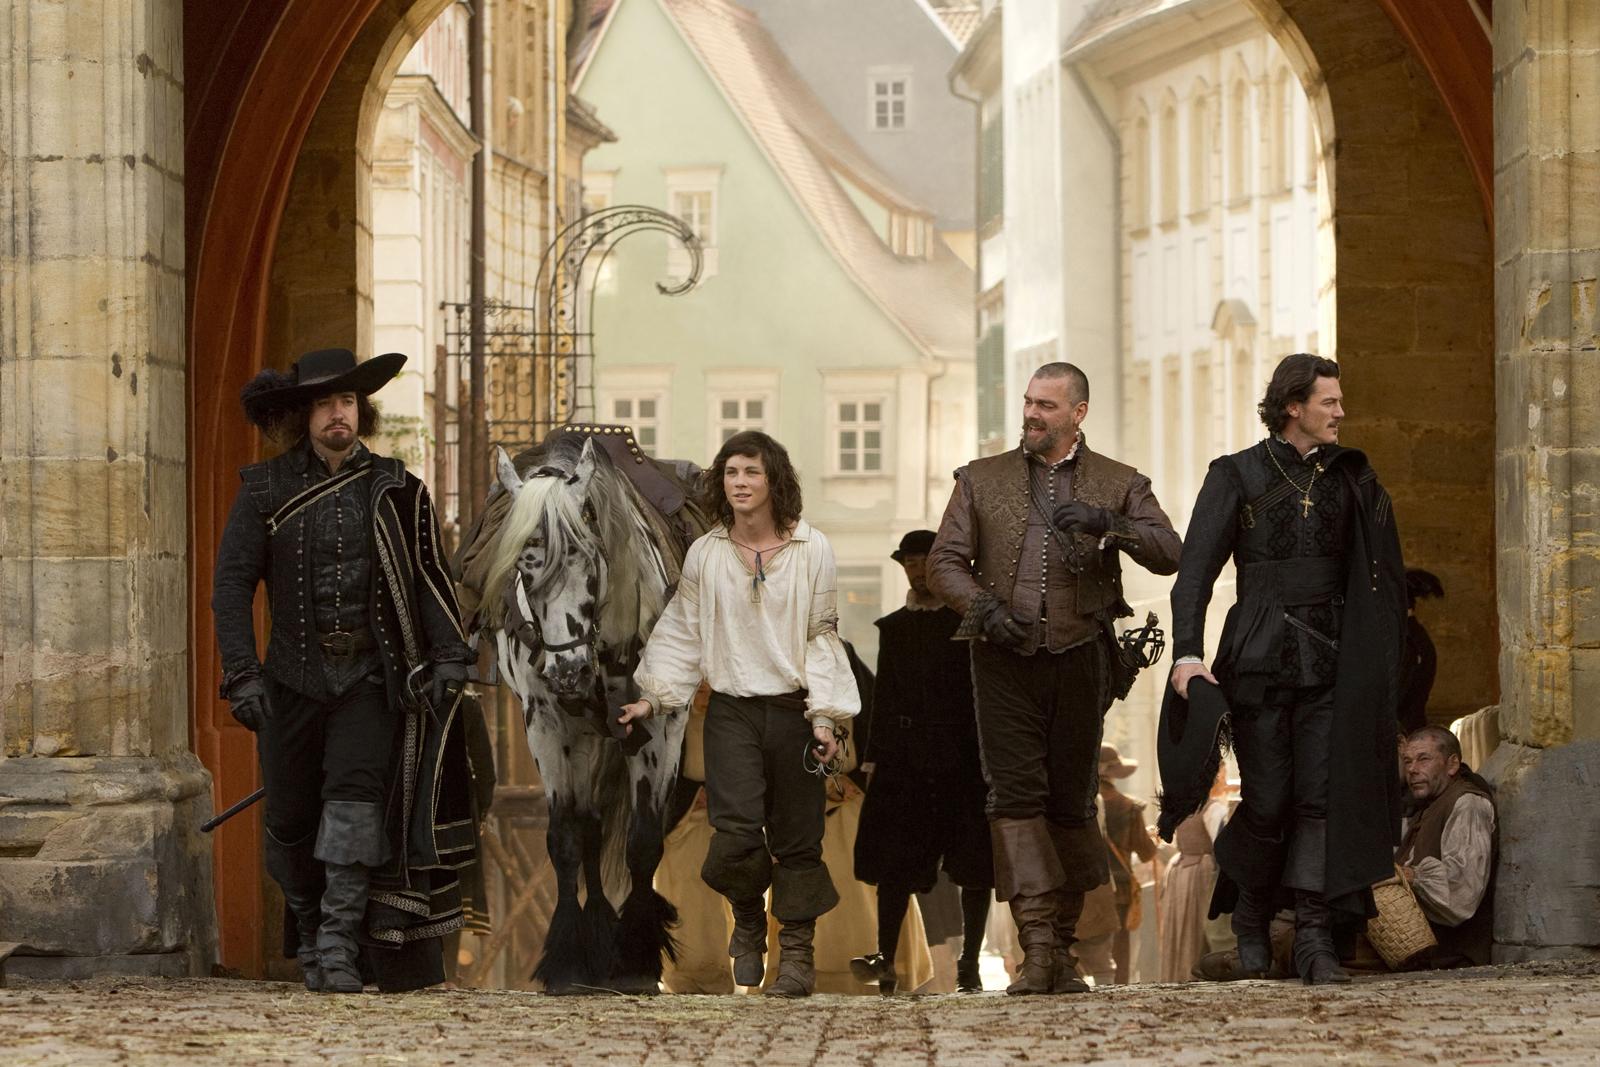 http://2.bp.blogspot.com/_DFNQQlUklEM/TRbARX-wQQI/AAAAAAAAA0A/duHuKnF-bVM/s1600/the_three_musketeers-official-image.jpg